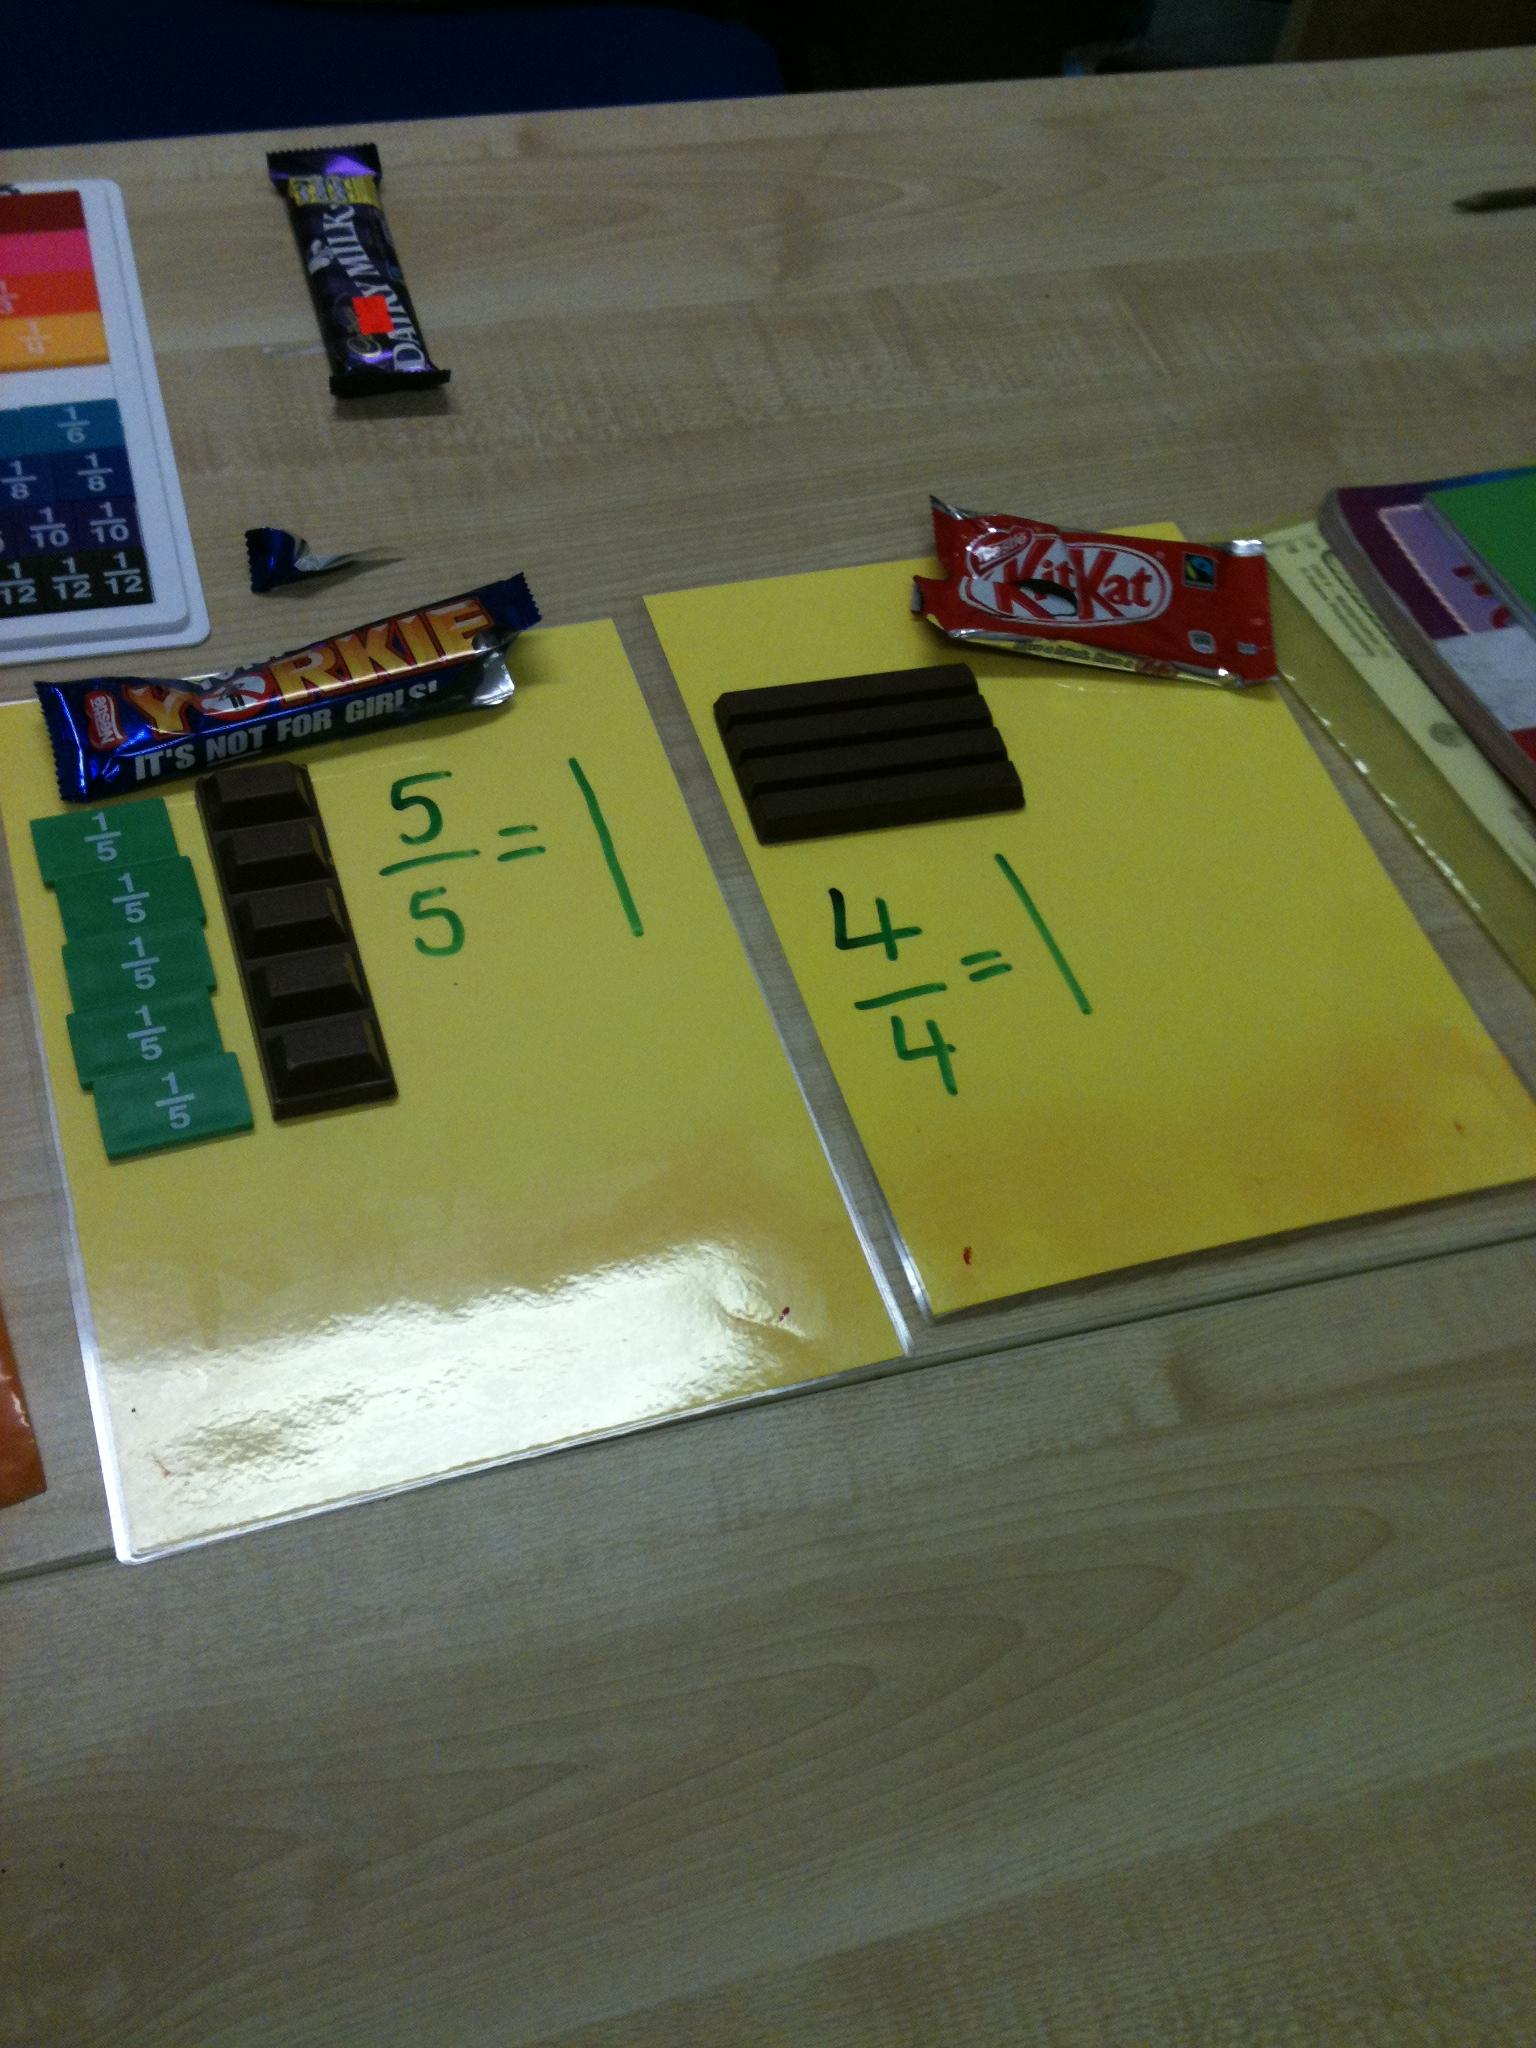 5/5 Yorkie chocolate fraction, 4/4 Kit Kat chocolate fraction